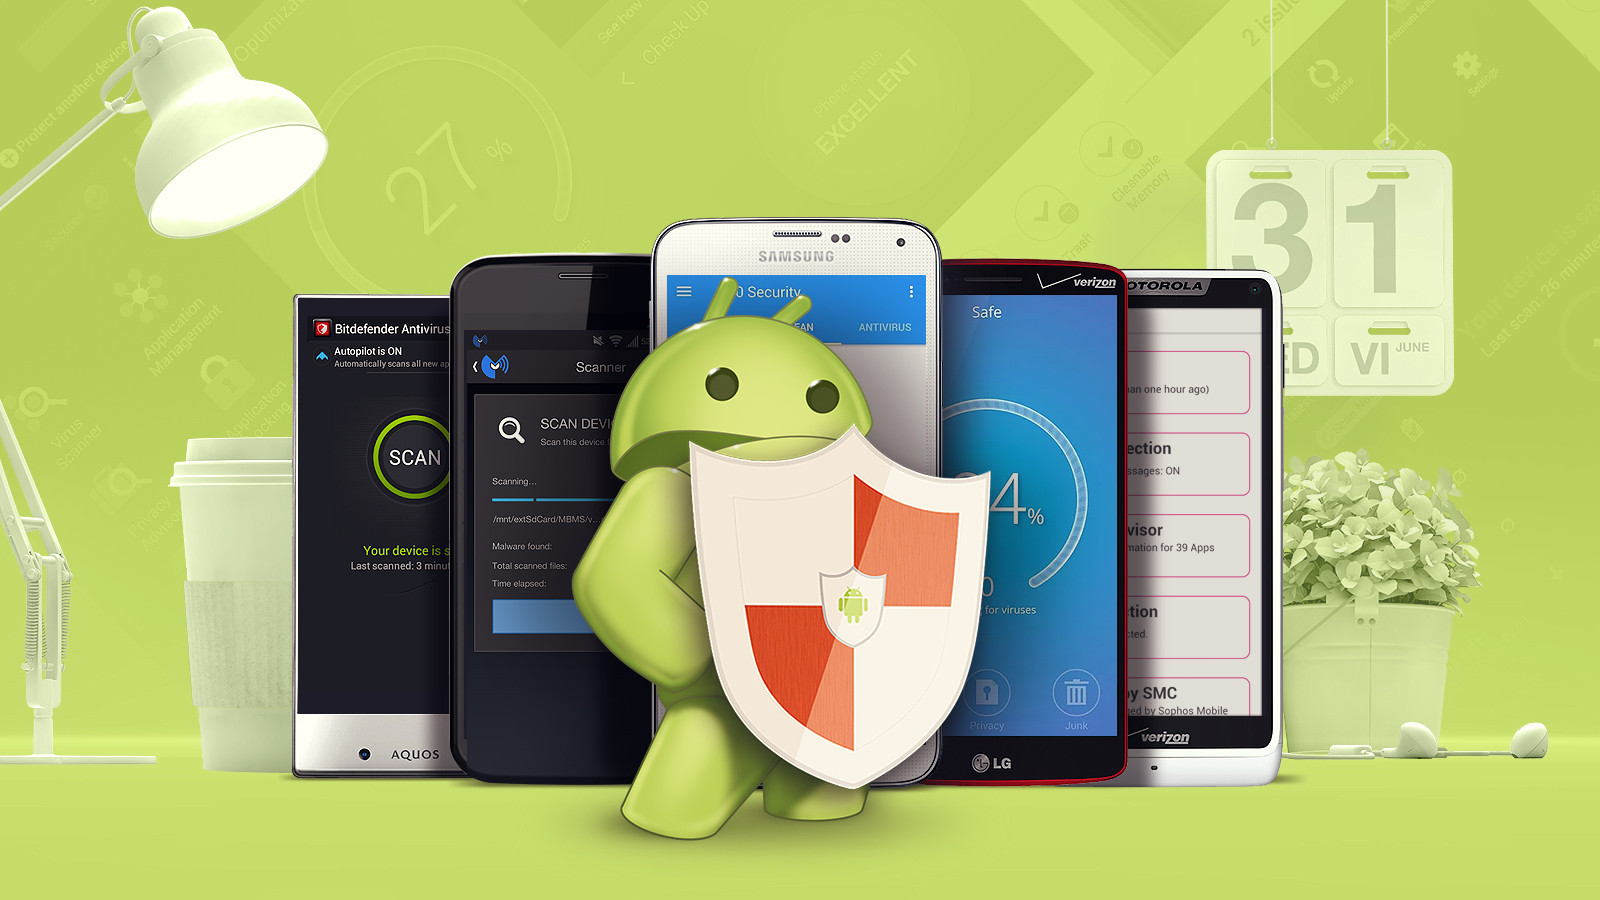 Biľšisť antyvirusiv dlja Android ne zahystjať vaš smartfon